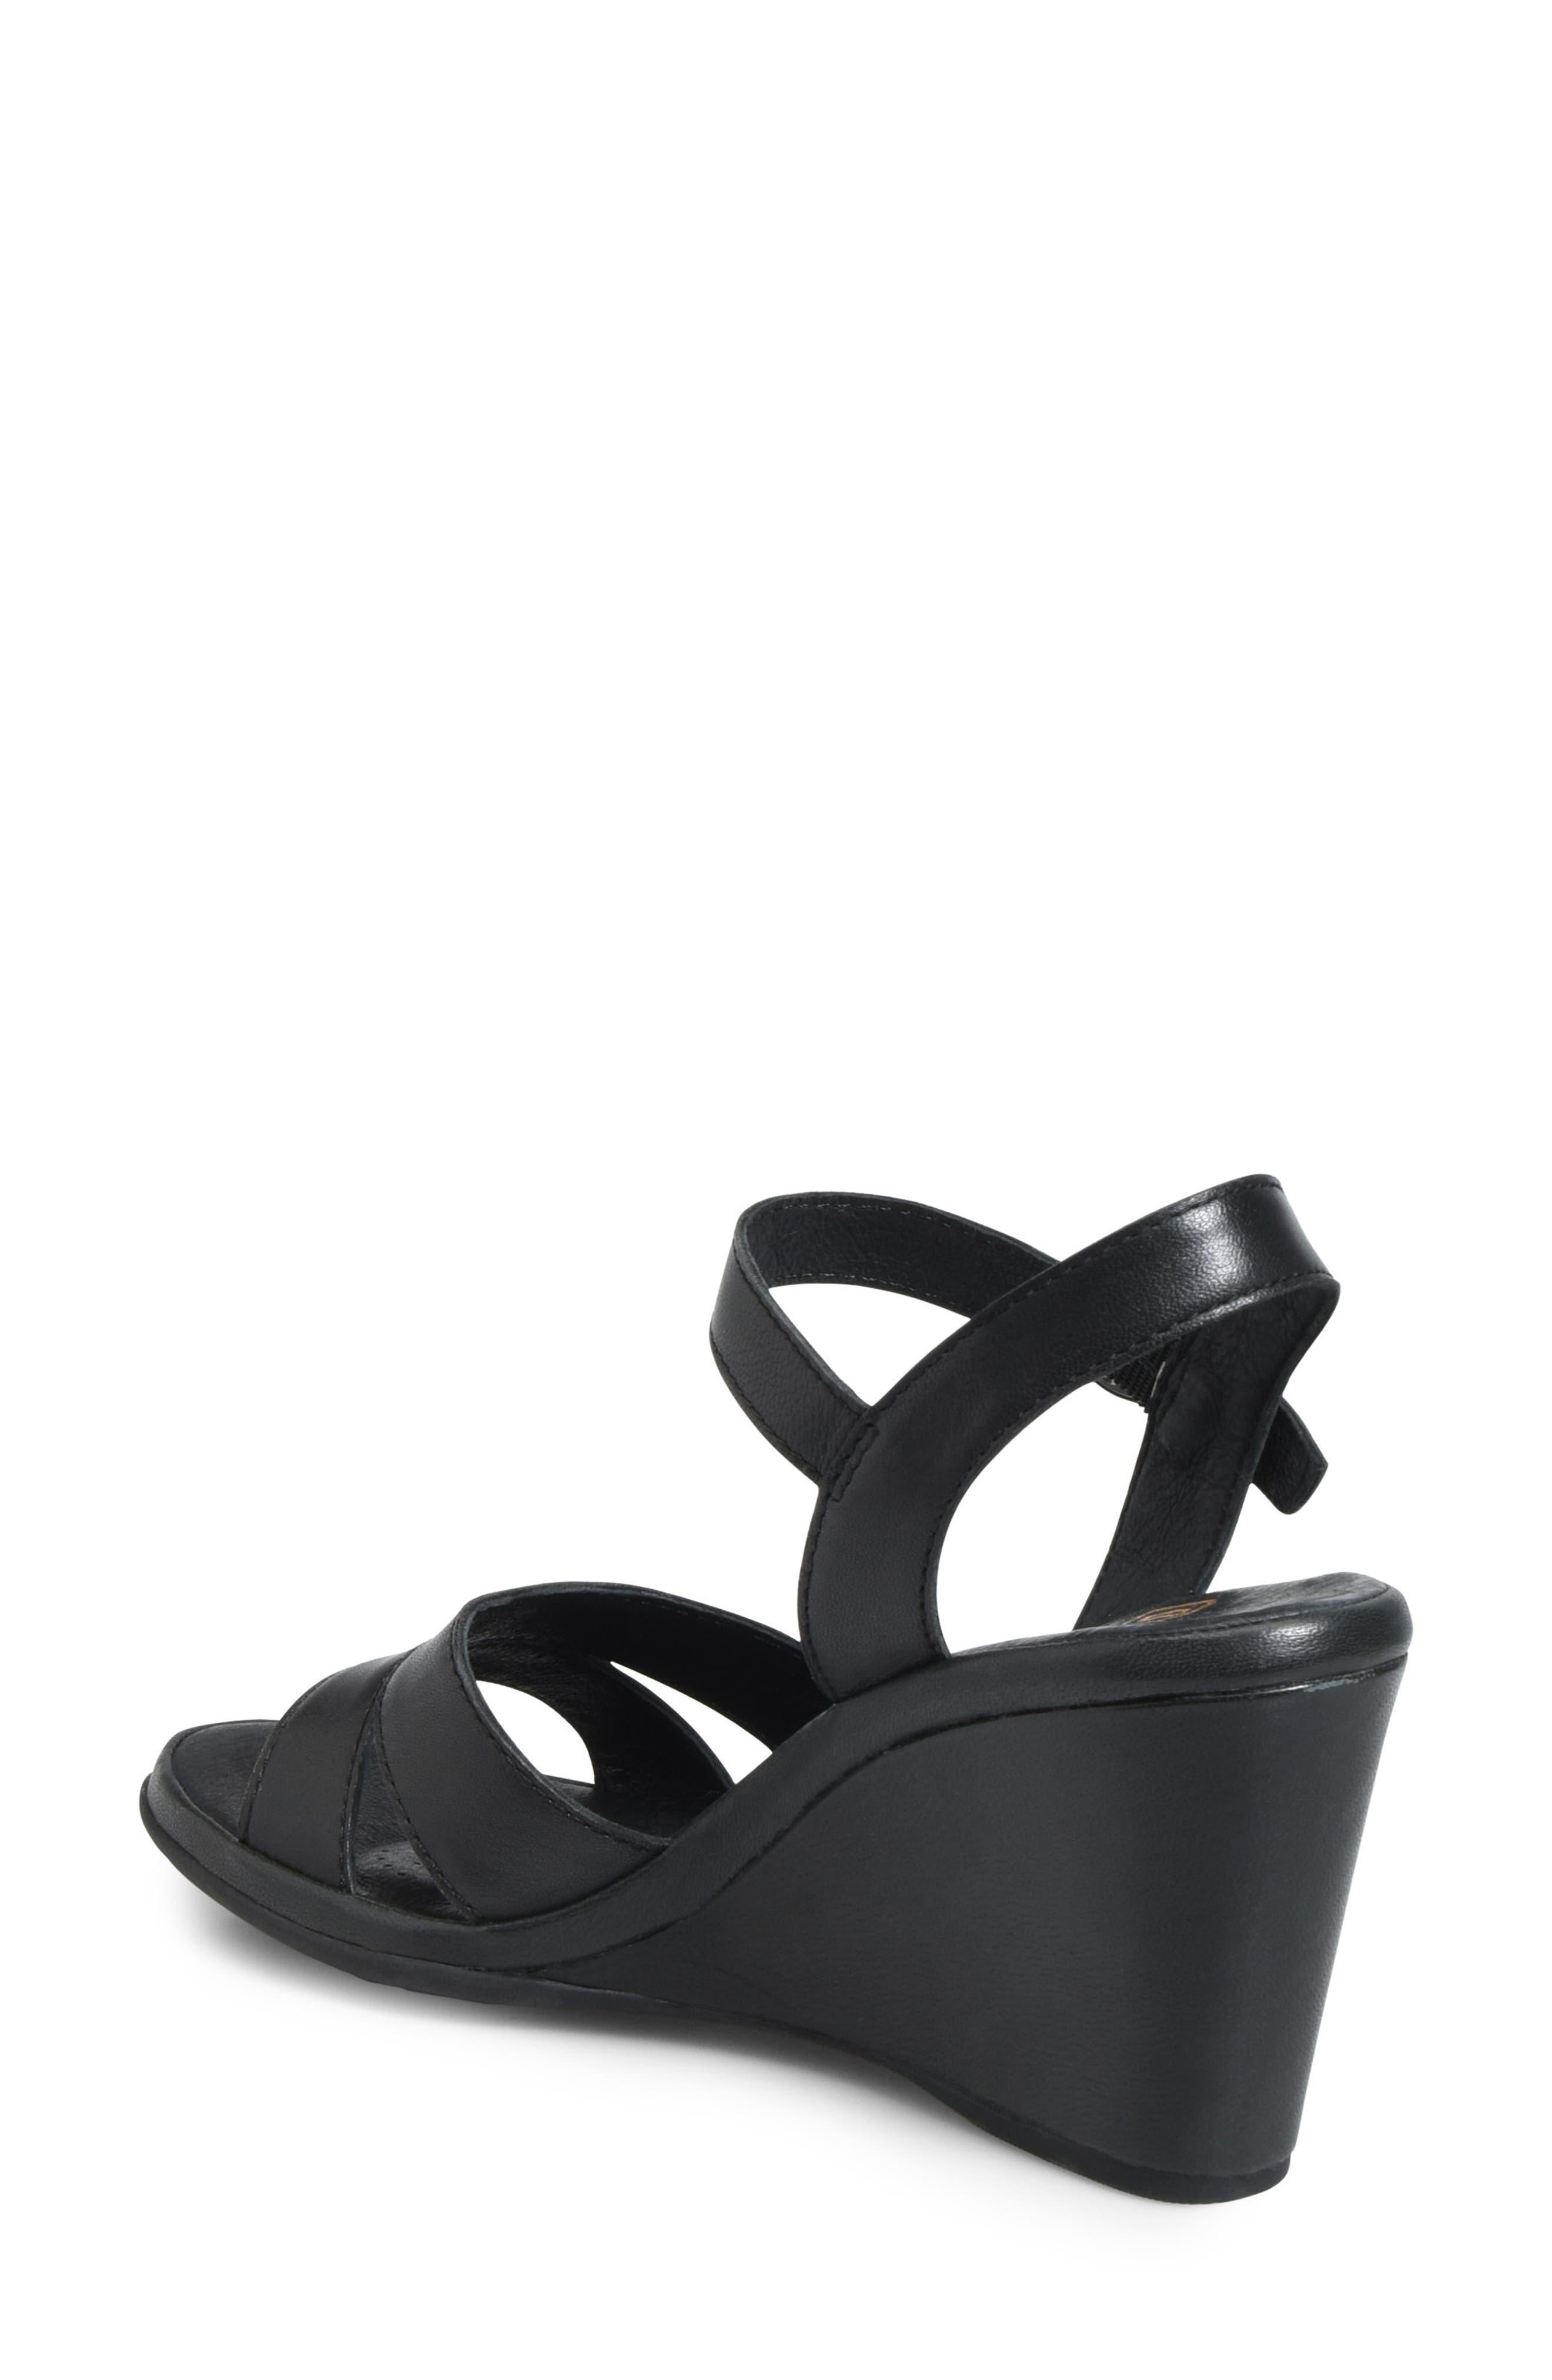 ONO, Hydro Wedge Sandal, Alternate thumbnail 2, color, BLACK LEATHER